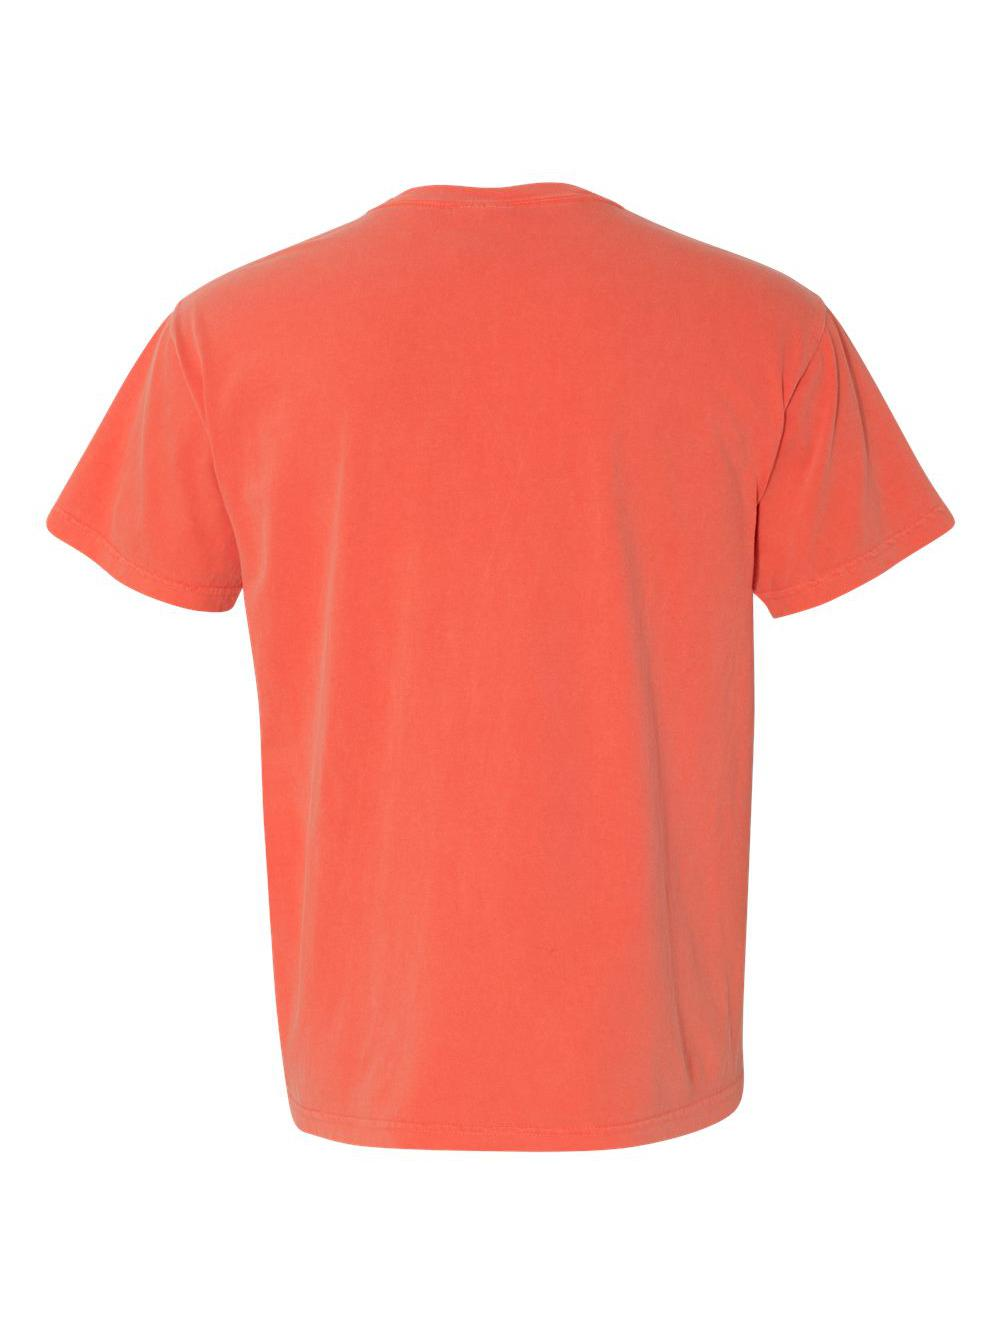 Comfort-Colors-Garment-Dyed-Heavyweight-Ringspun-Short-Sleeve-Shirt-1717 thumbnail 22